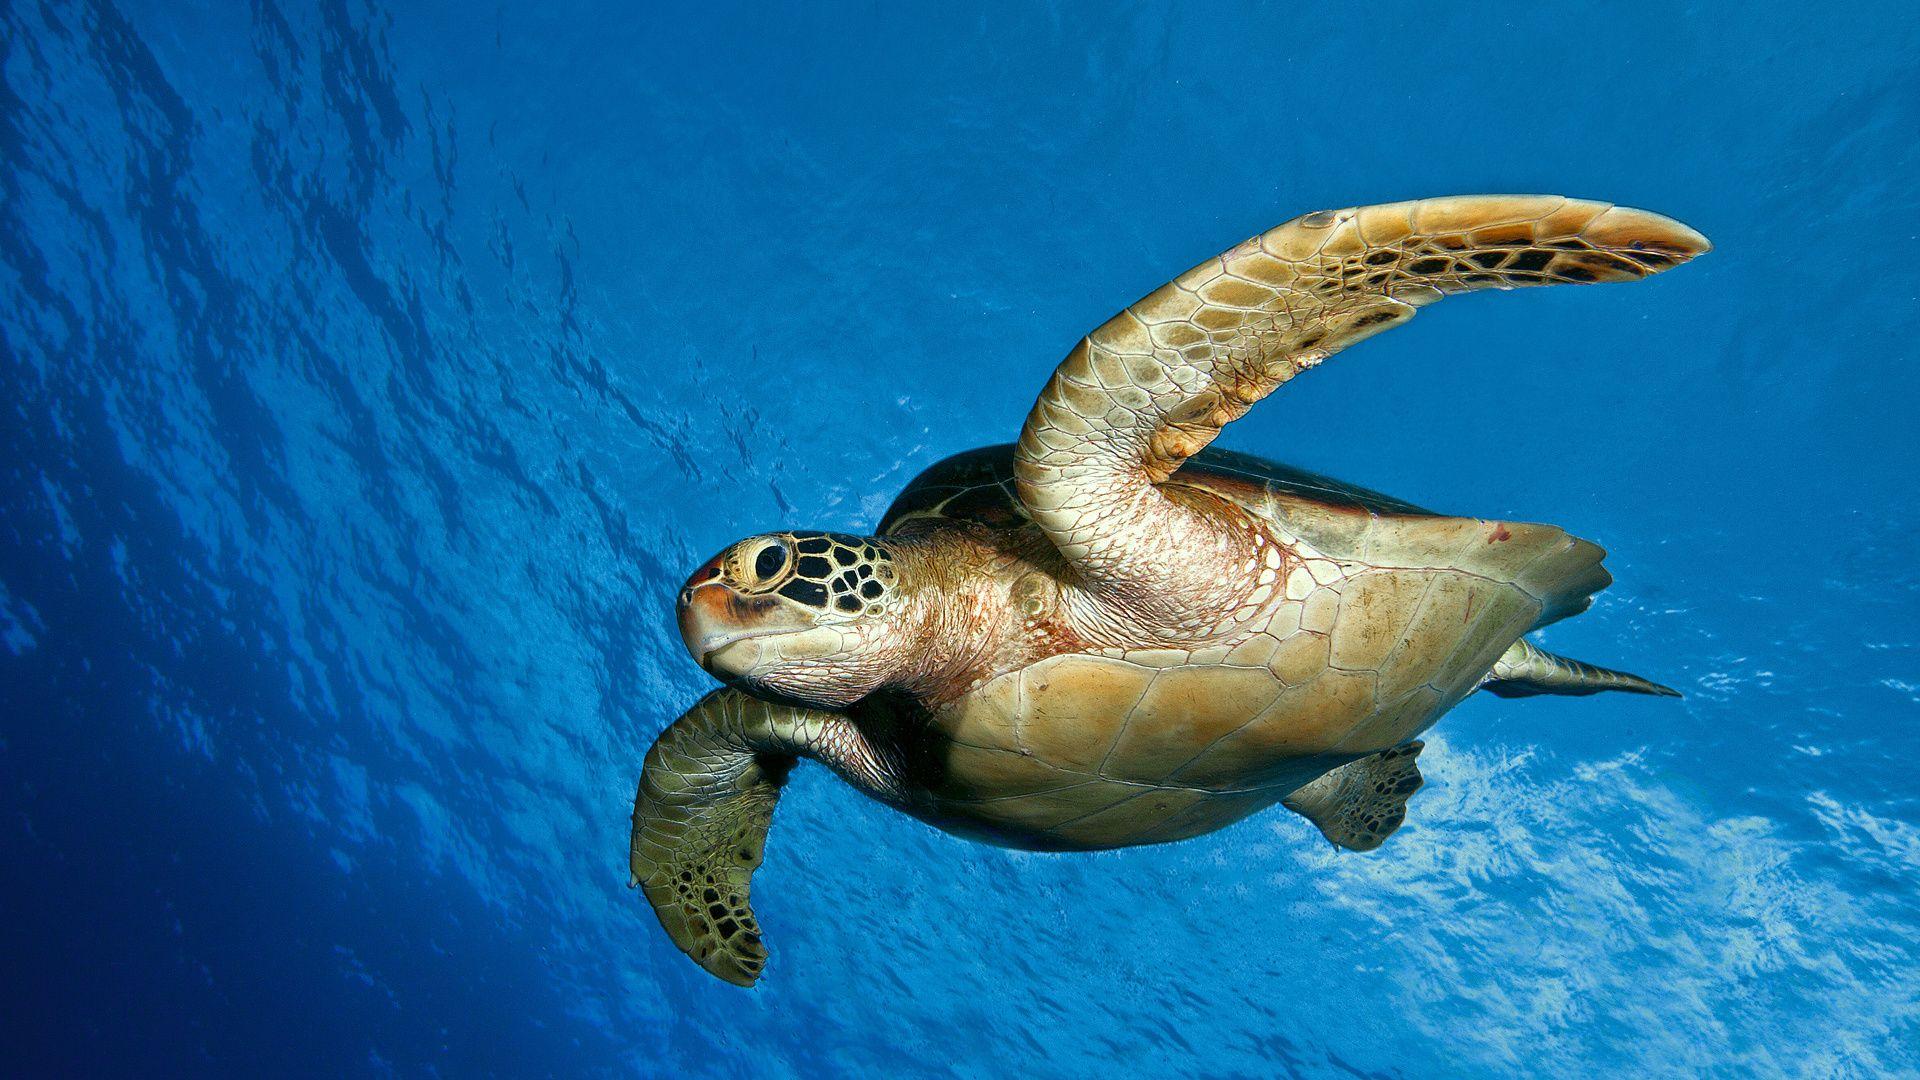 Sea Turtle Wallpaper Hd